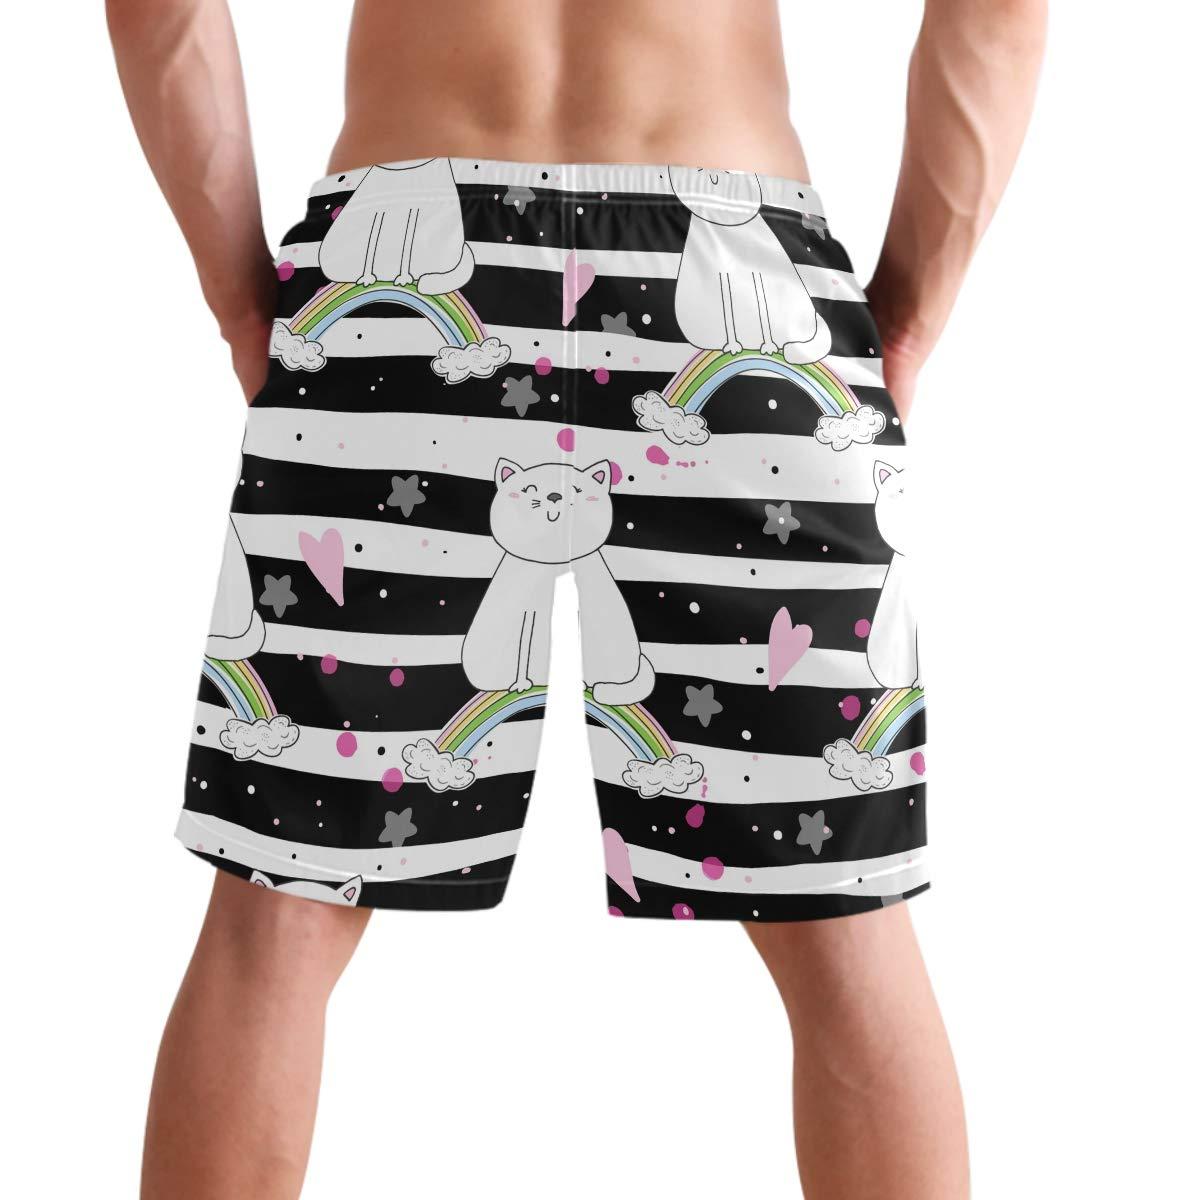 visesunny Mens Cat Rainbow Striped Swimtrunks Quick Dry Casual Hawaiian Mesh Lining Beach Board Shorts with Pockets S-XXL